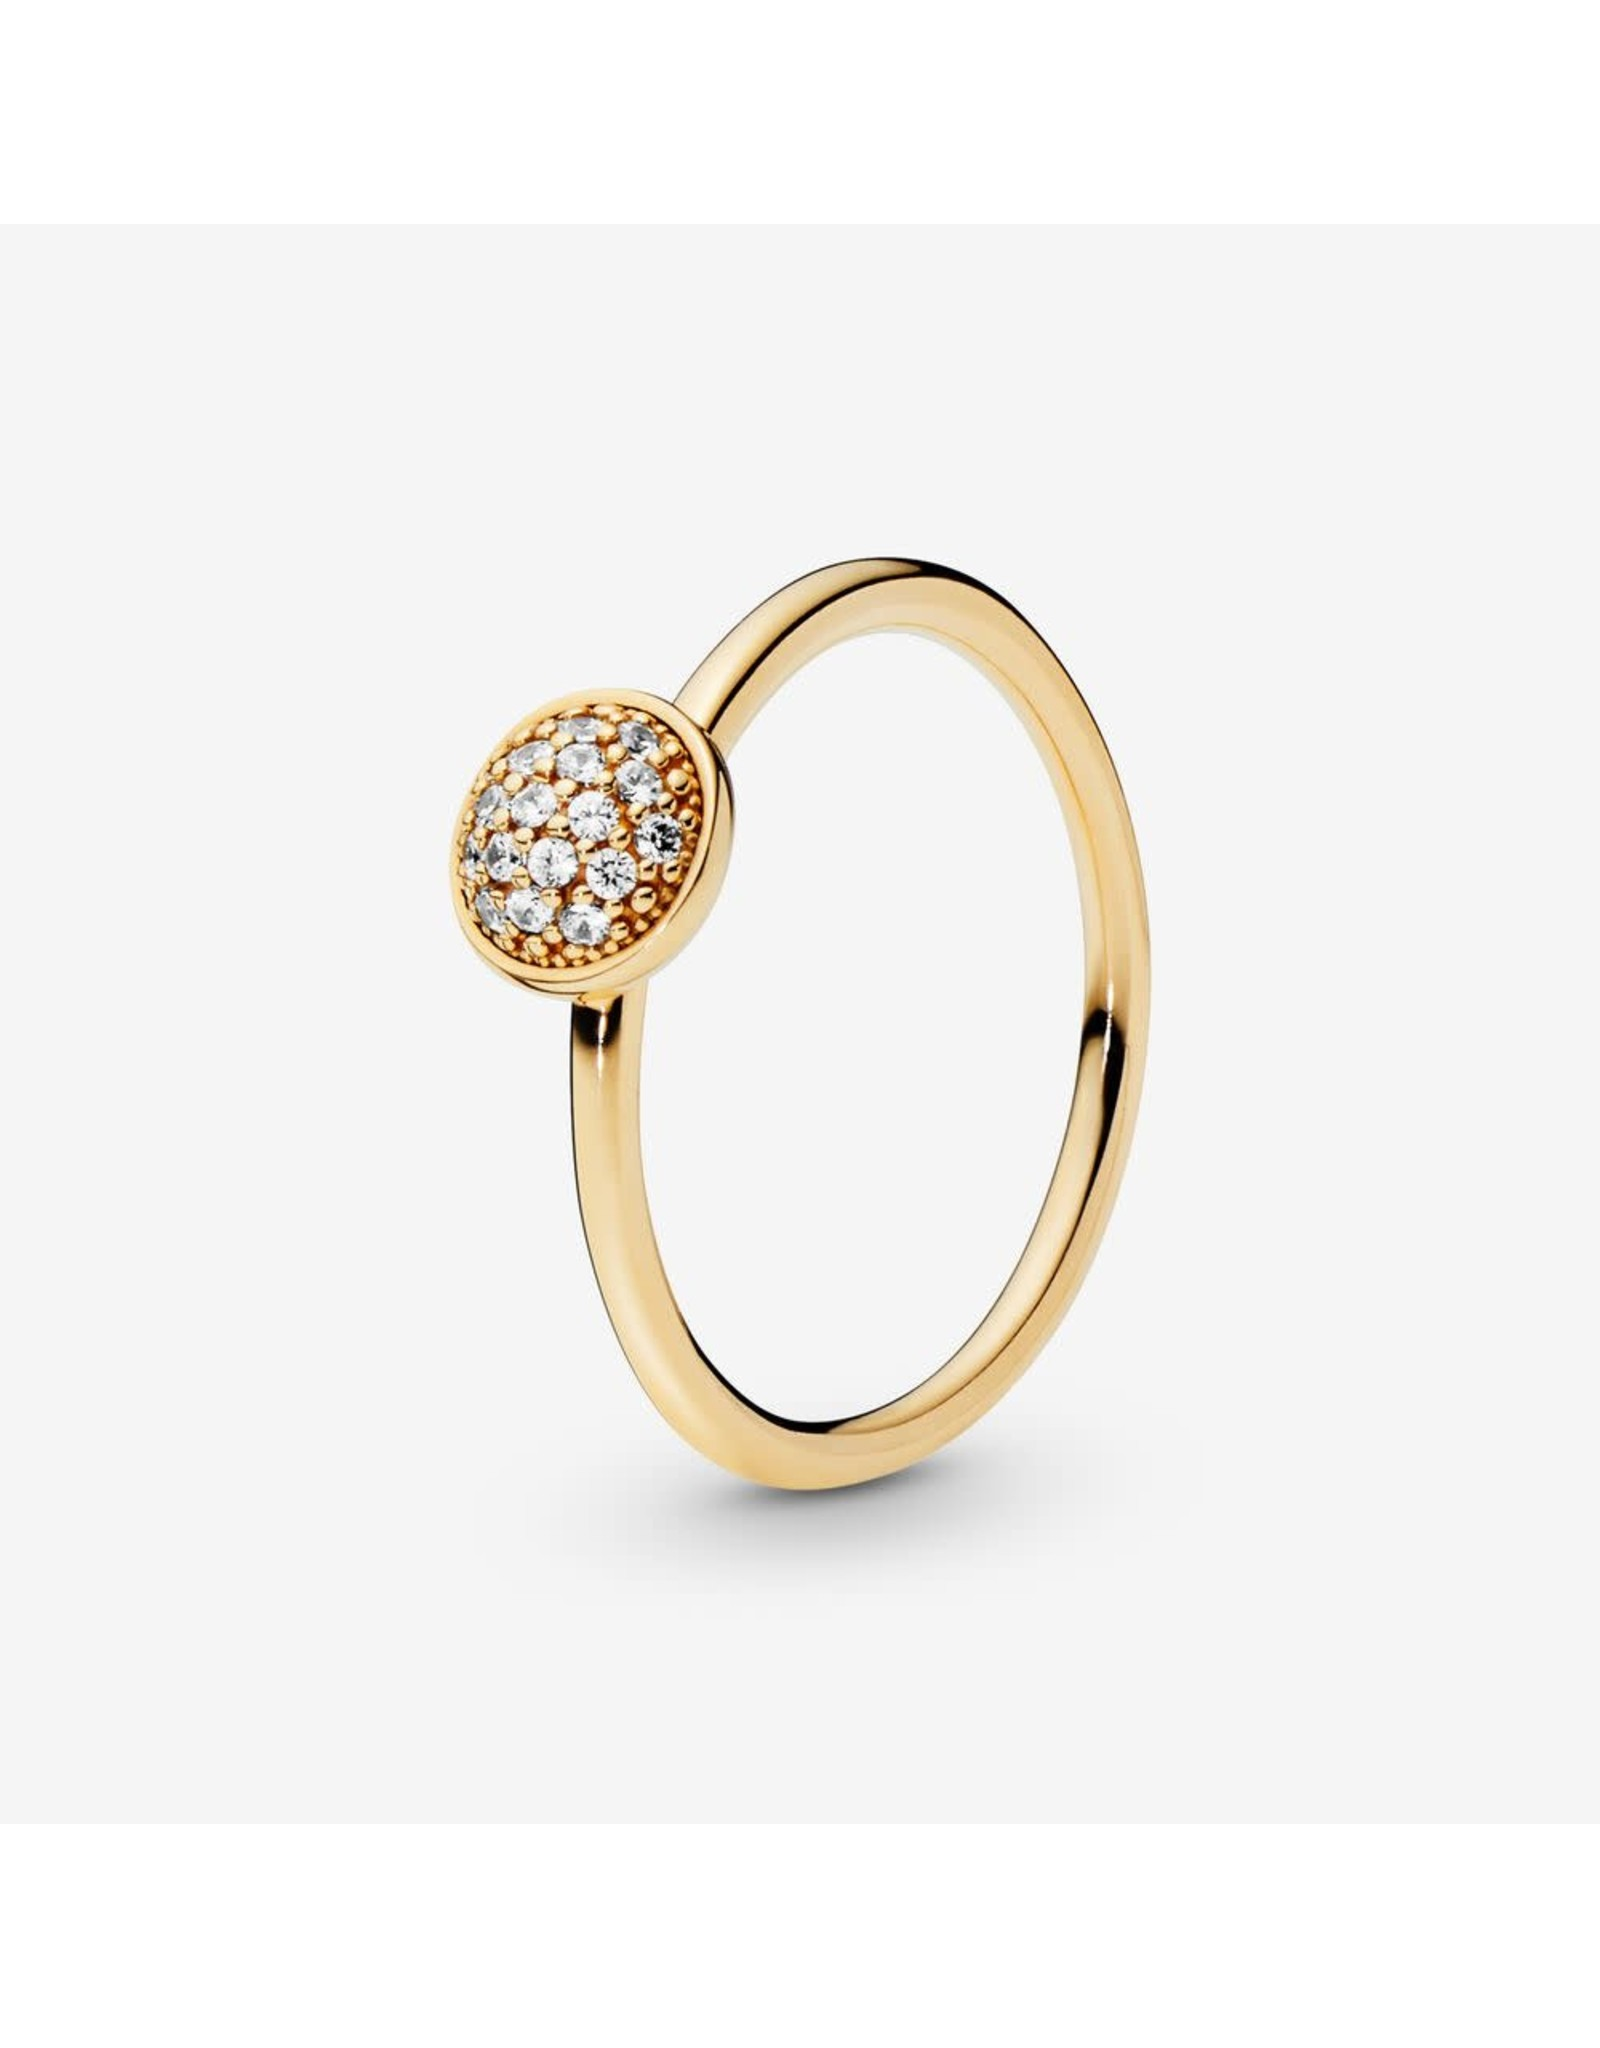 Pandora Pandora Ring ,150187CZ, 14K Gold,Dazzling Droplet, Clear CZ